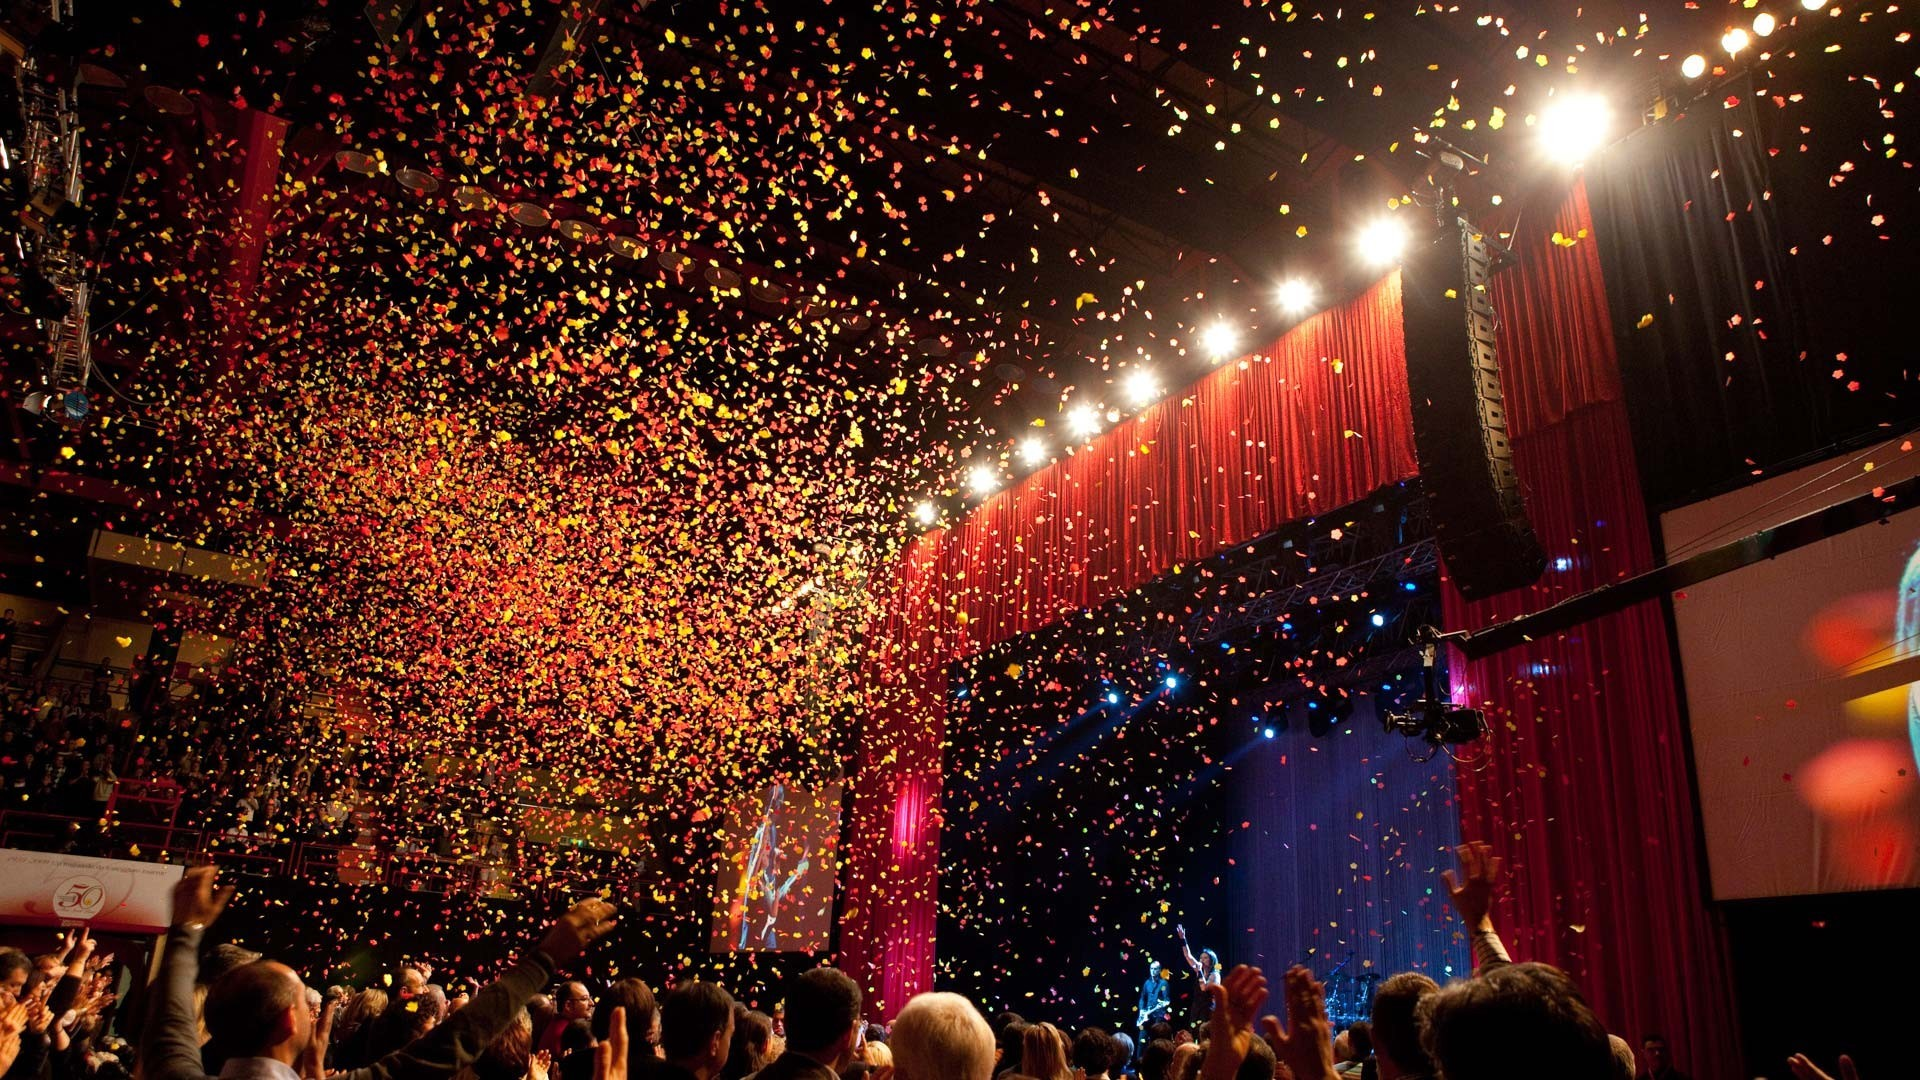 ADDUBA-We Create Your Dream Event